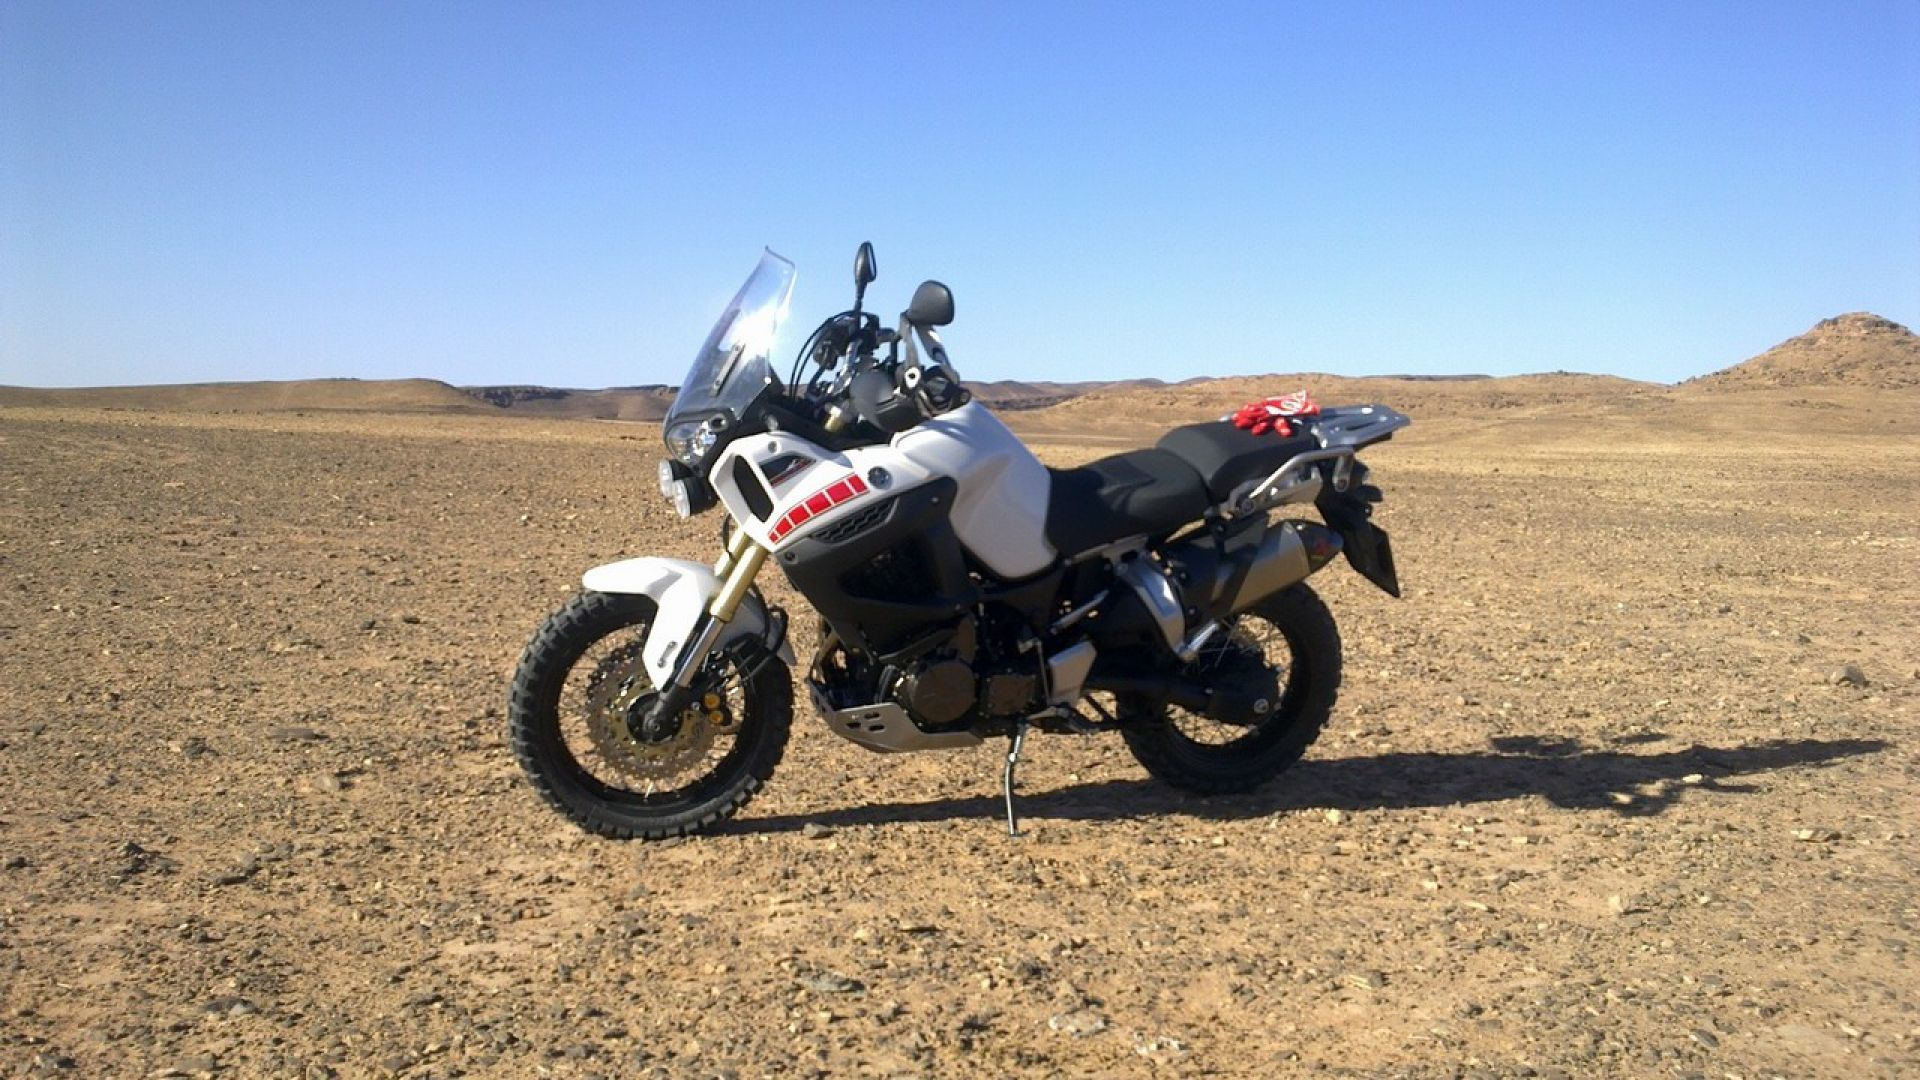 Immagine 172: In Marocco con la Yamaha Super Ténéré